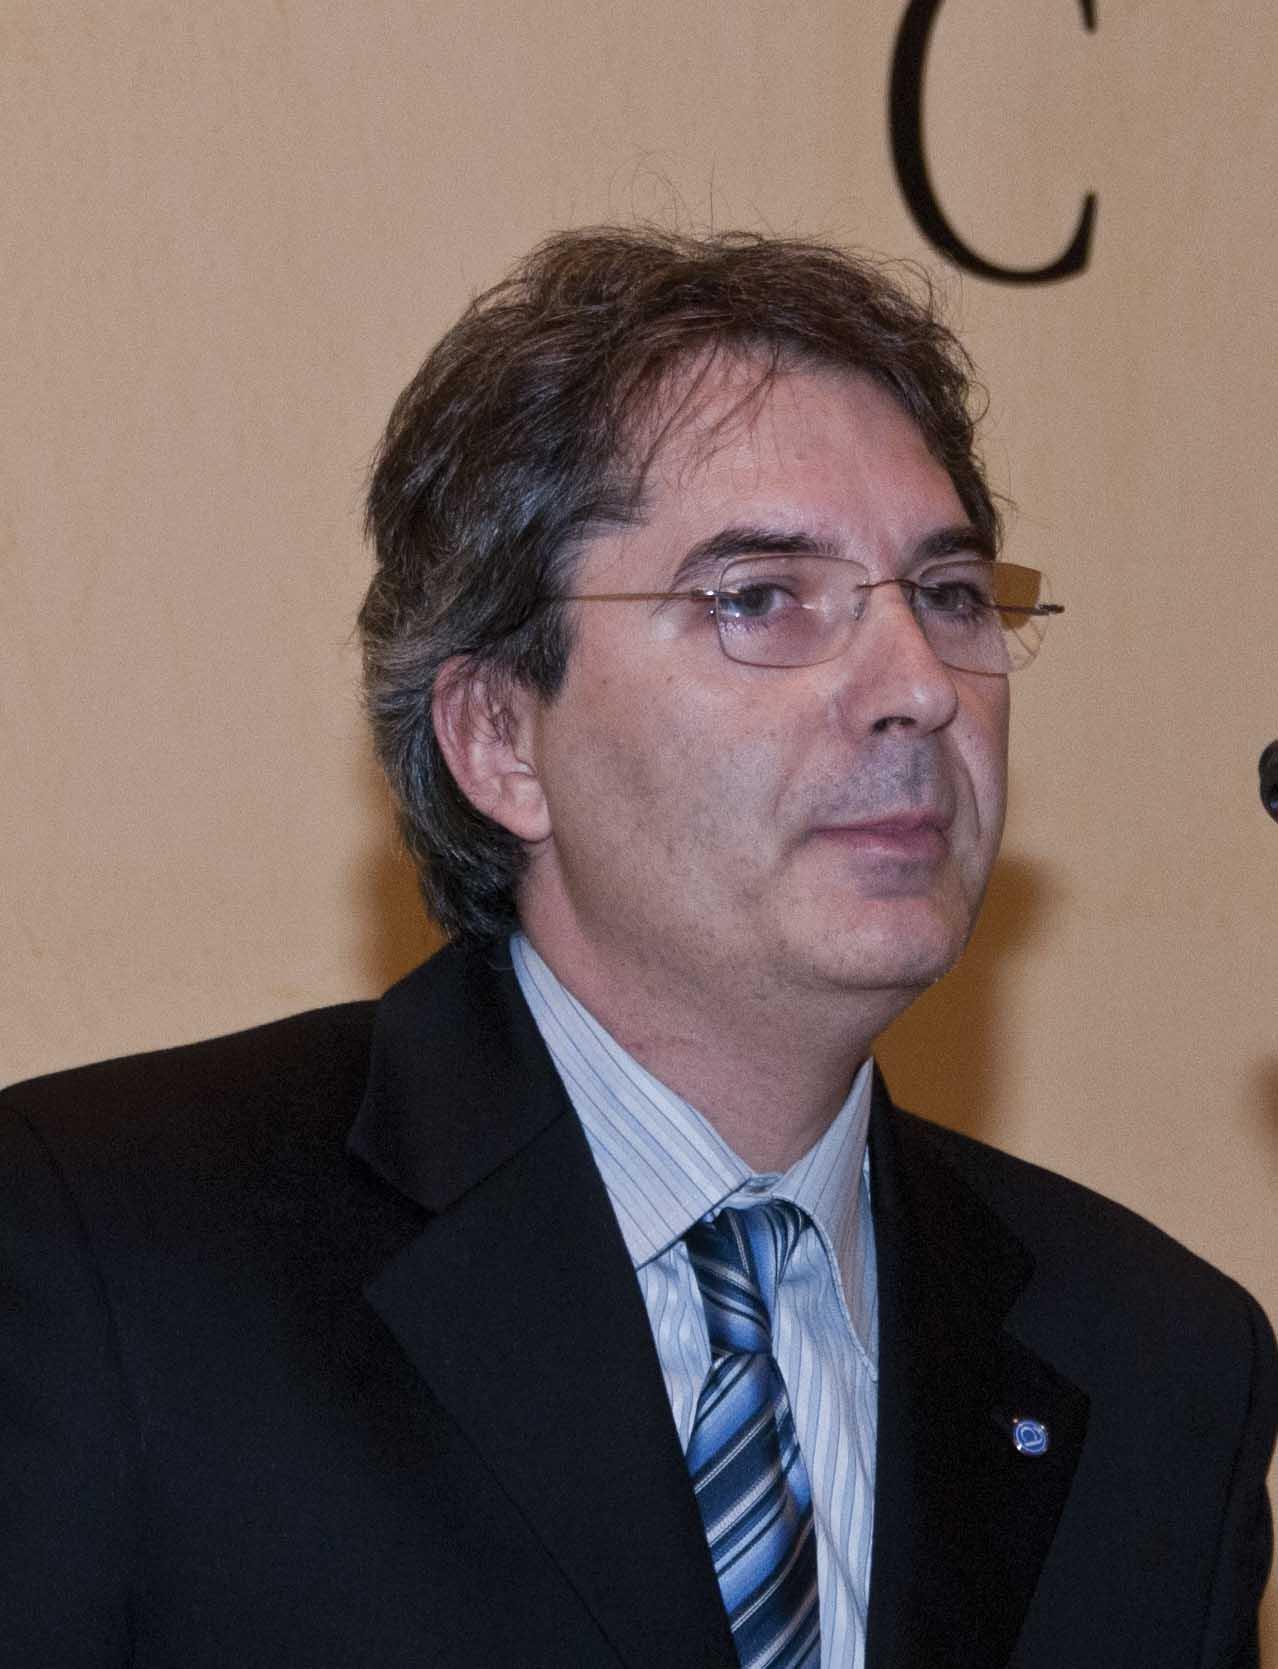 confartigianato assemblea verona presidente Andrea Bissoli 1 1